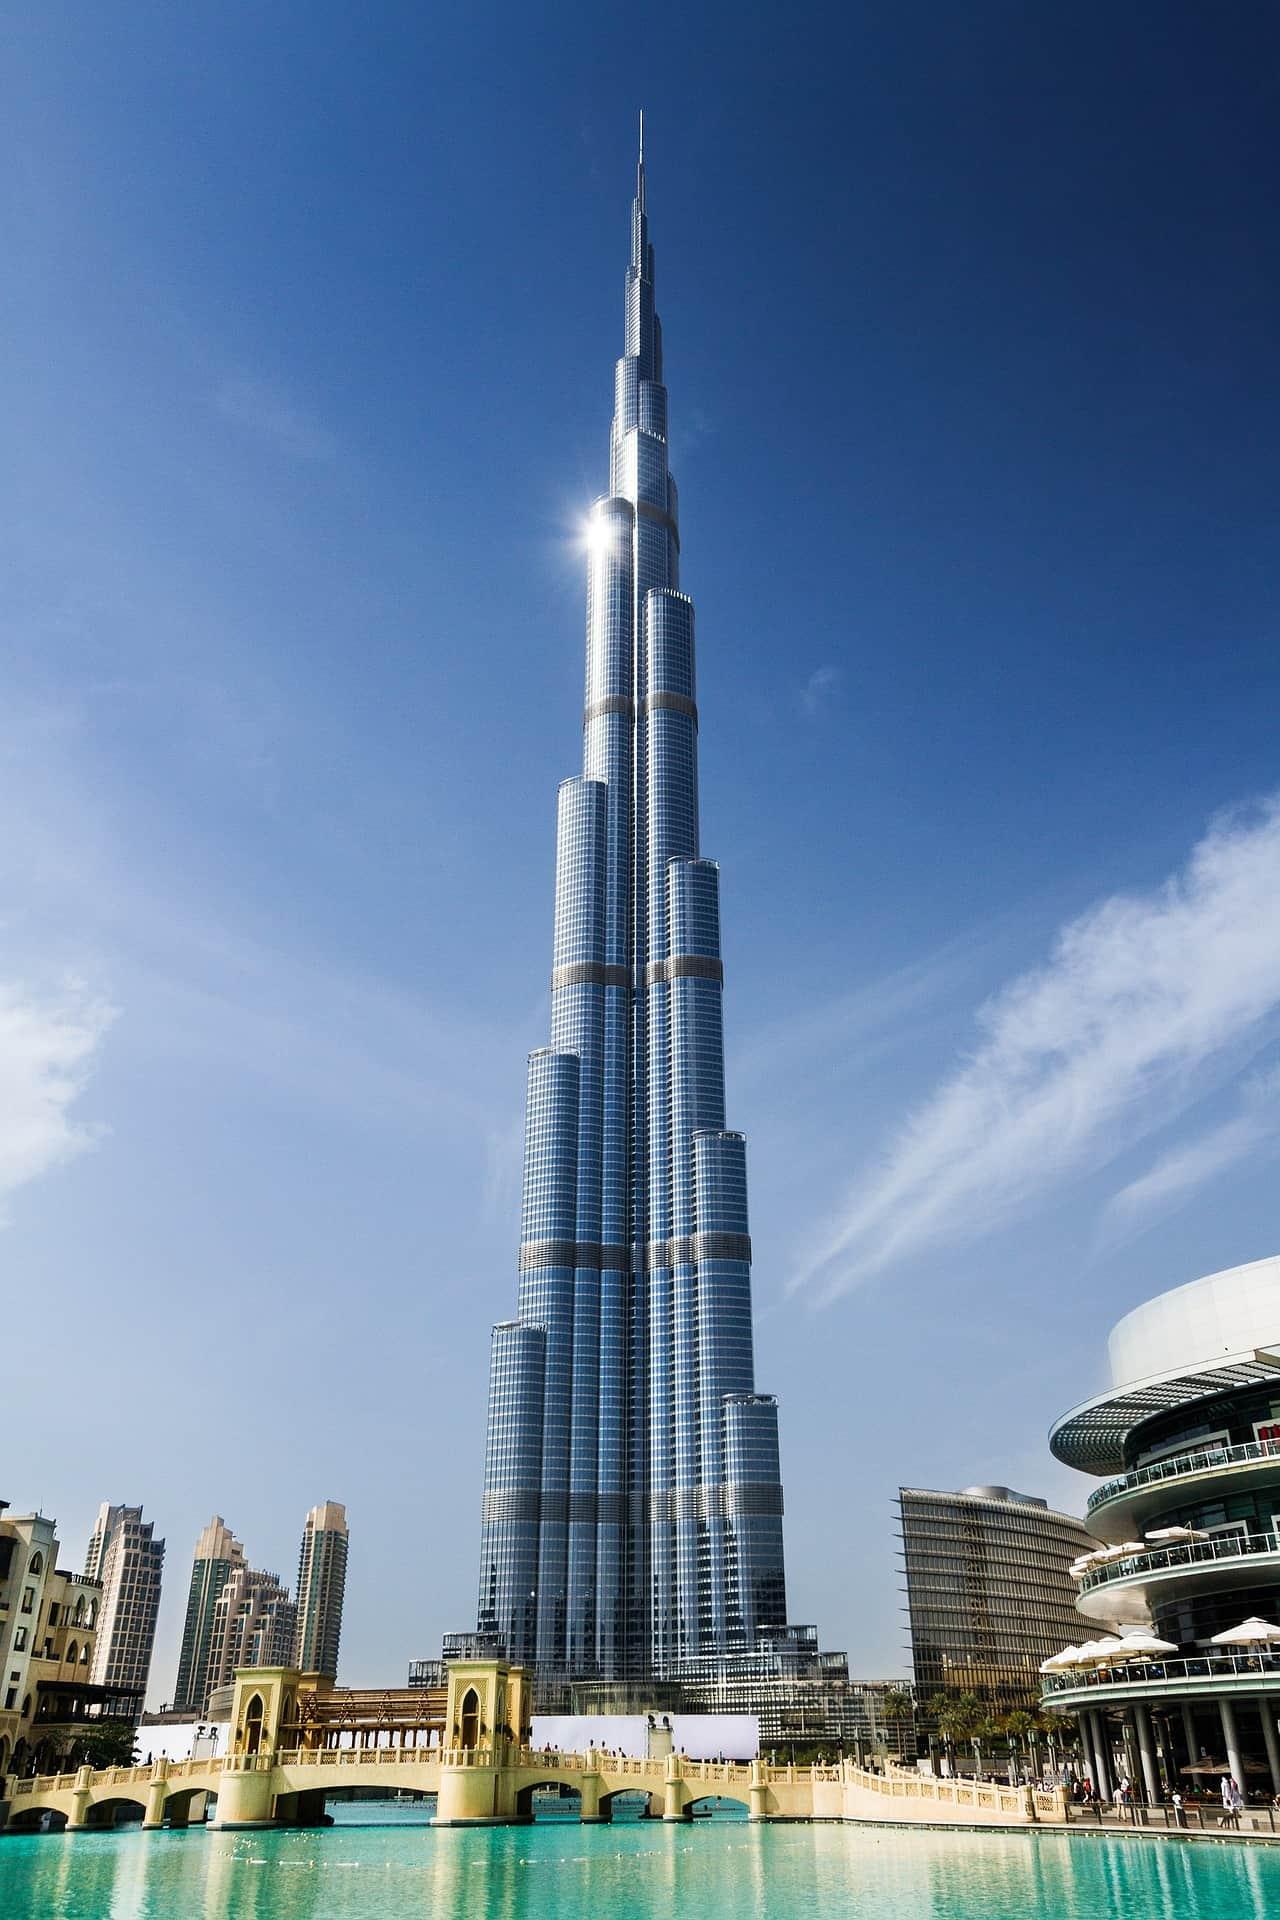 Top Tips for Visiting the Burj Khalifa Dubai